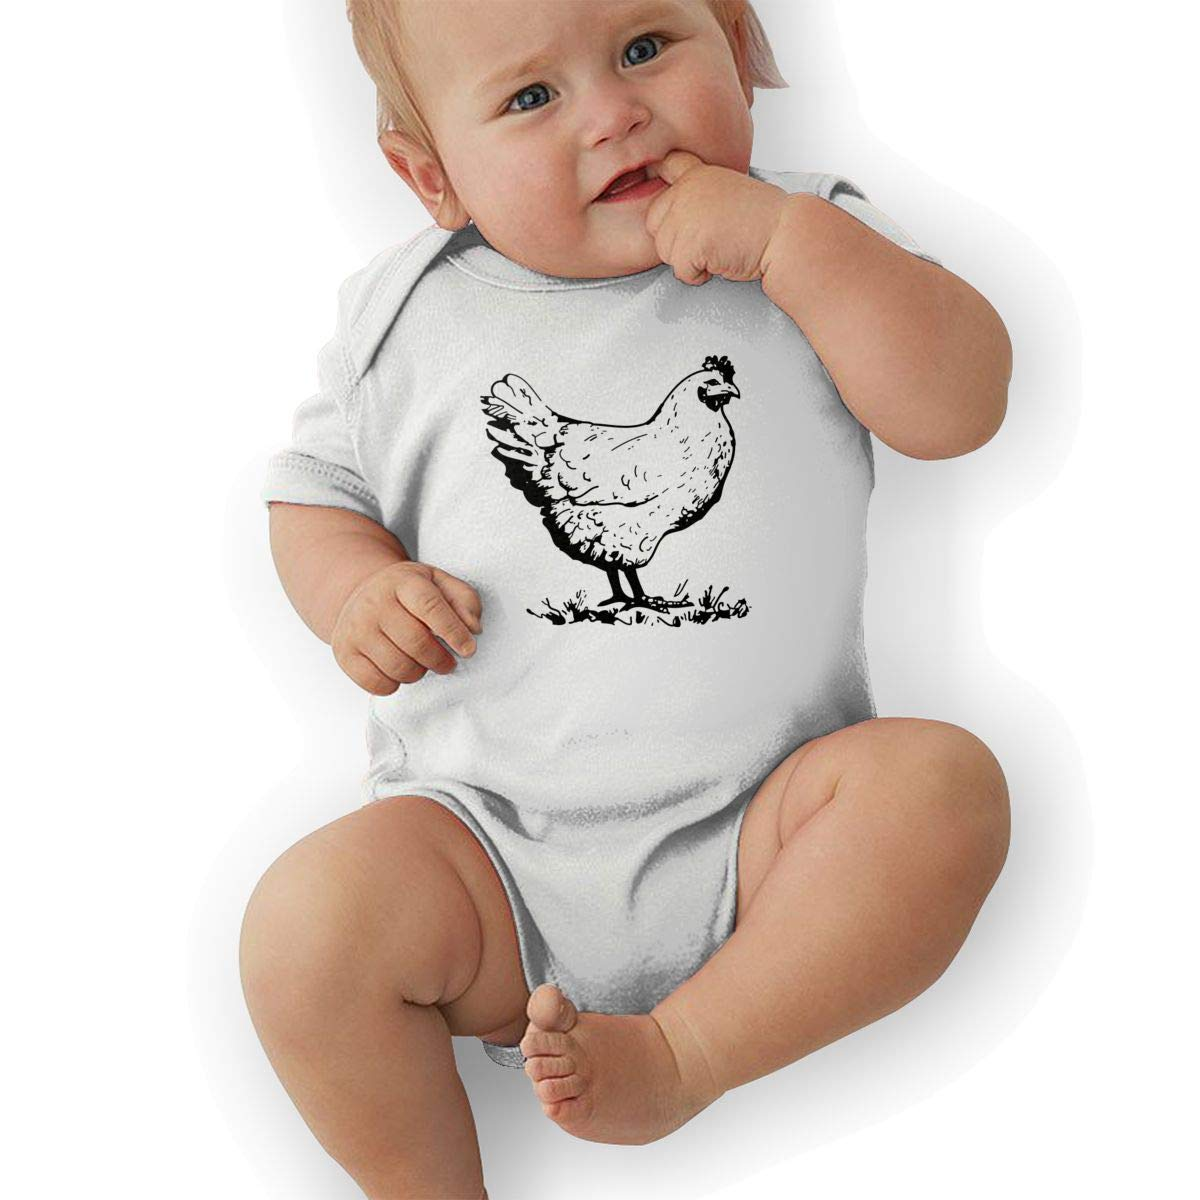 Toddler Baby Girls Bodysuit Short-Sleeve Onesie Funny Chicken Print Rompers Summer Pajamas